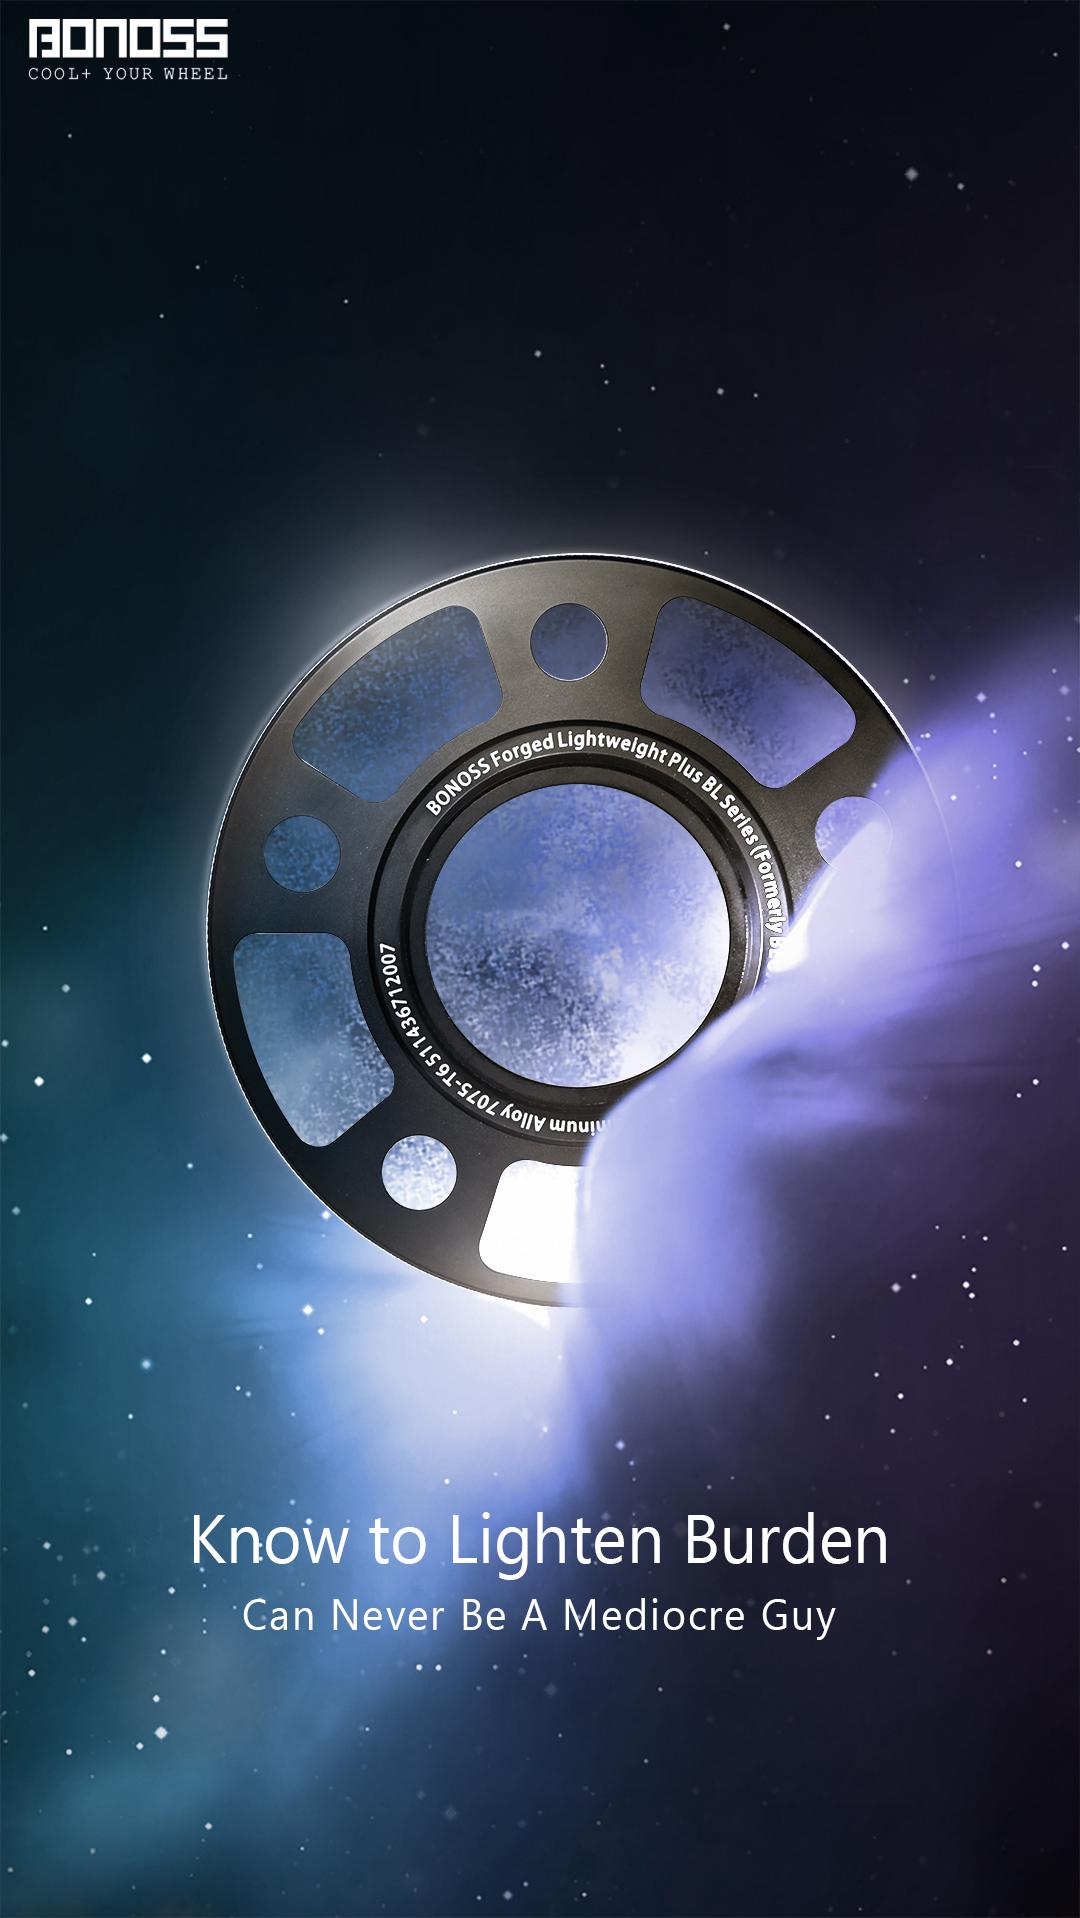 BONOSS-Forged-Lightweight-Plus-Wheel-Spacers-1